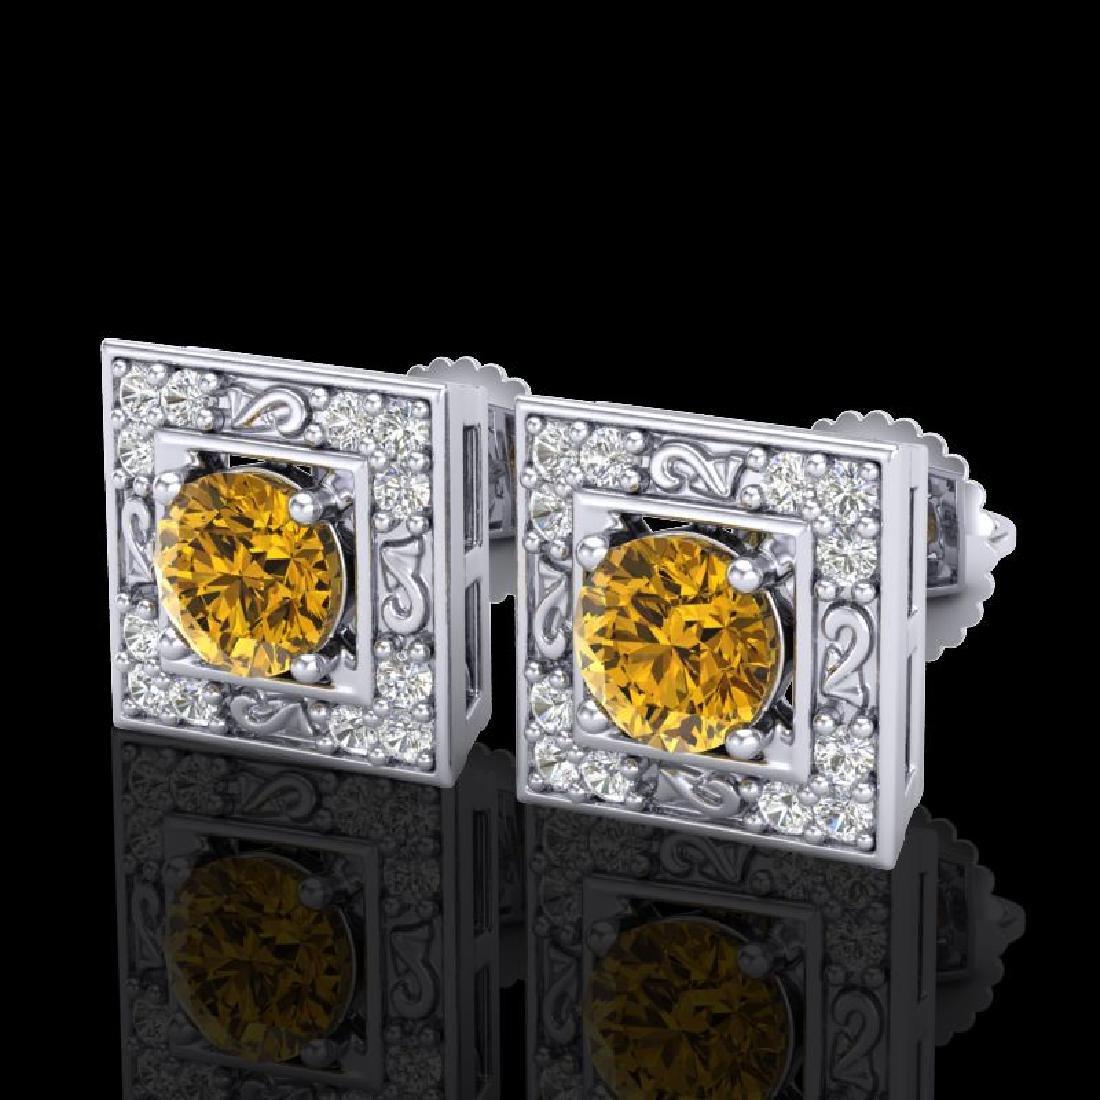 1.63 CTW Intense Fancy Yellow Diamond Art Deco Stud